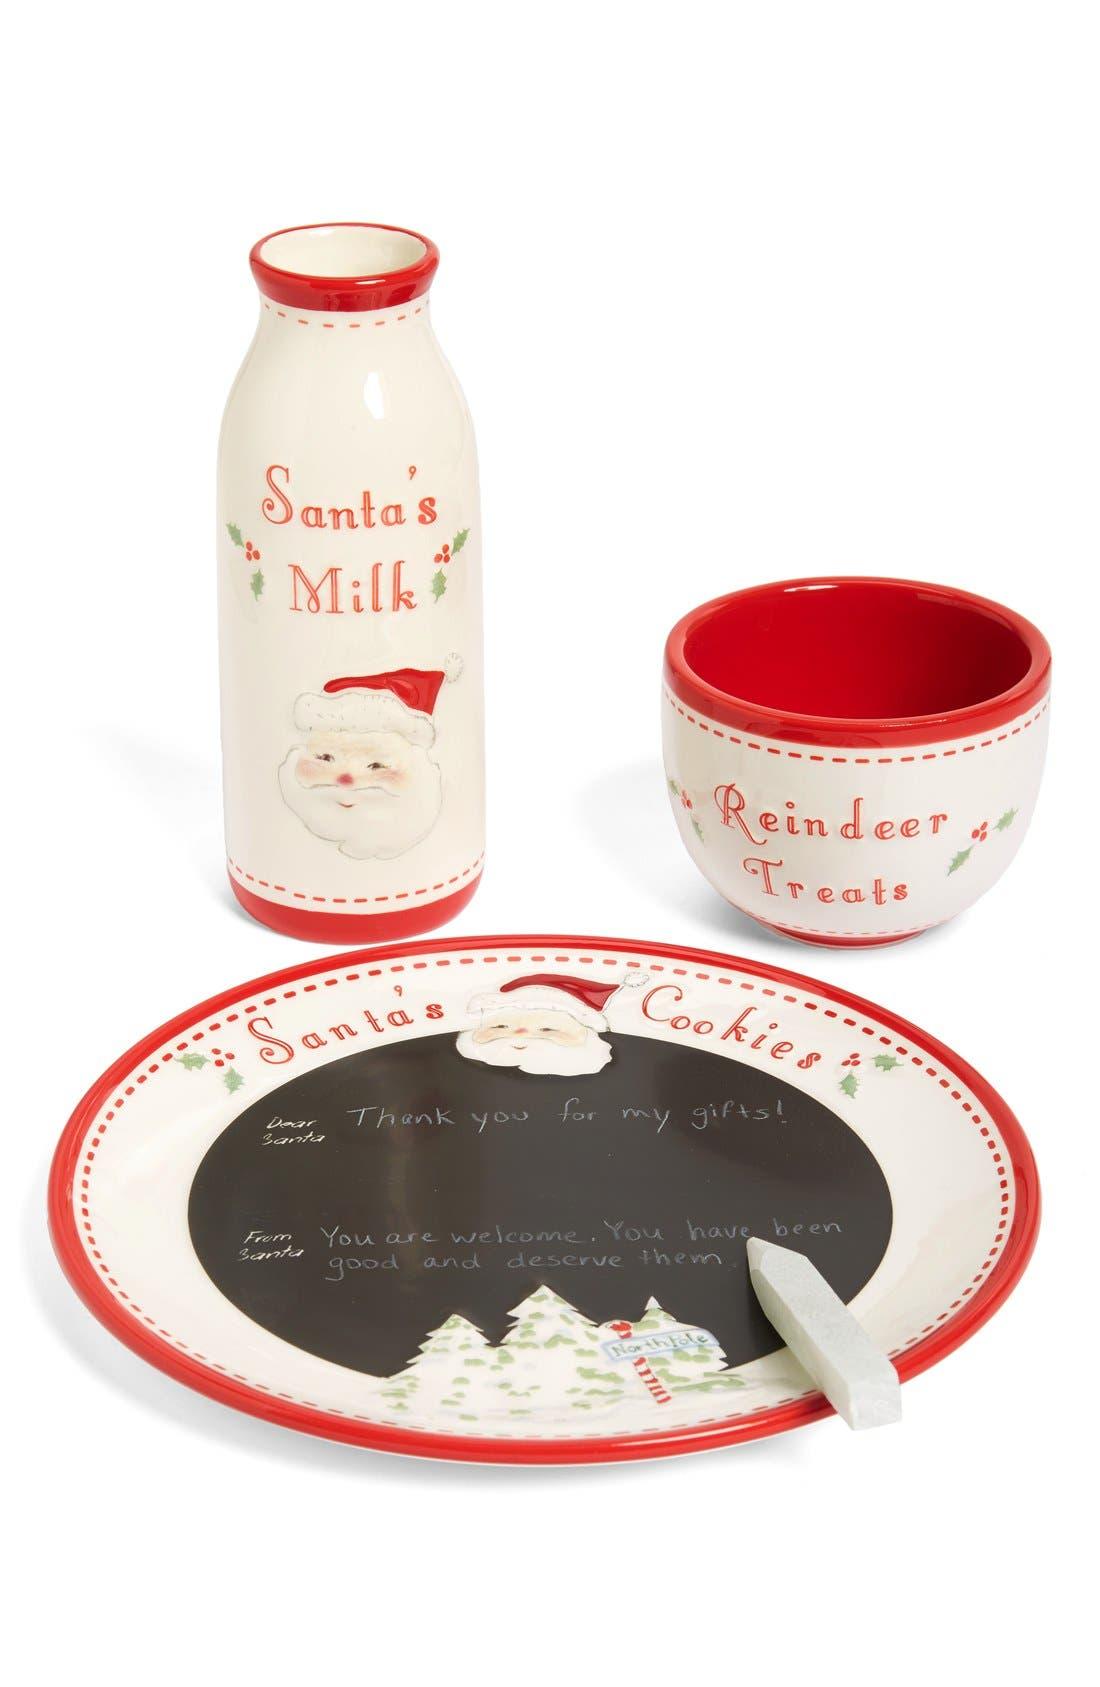 Child to Cherish Santa's Message Plate, Bowl & Bottle Set